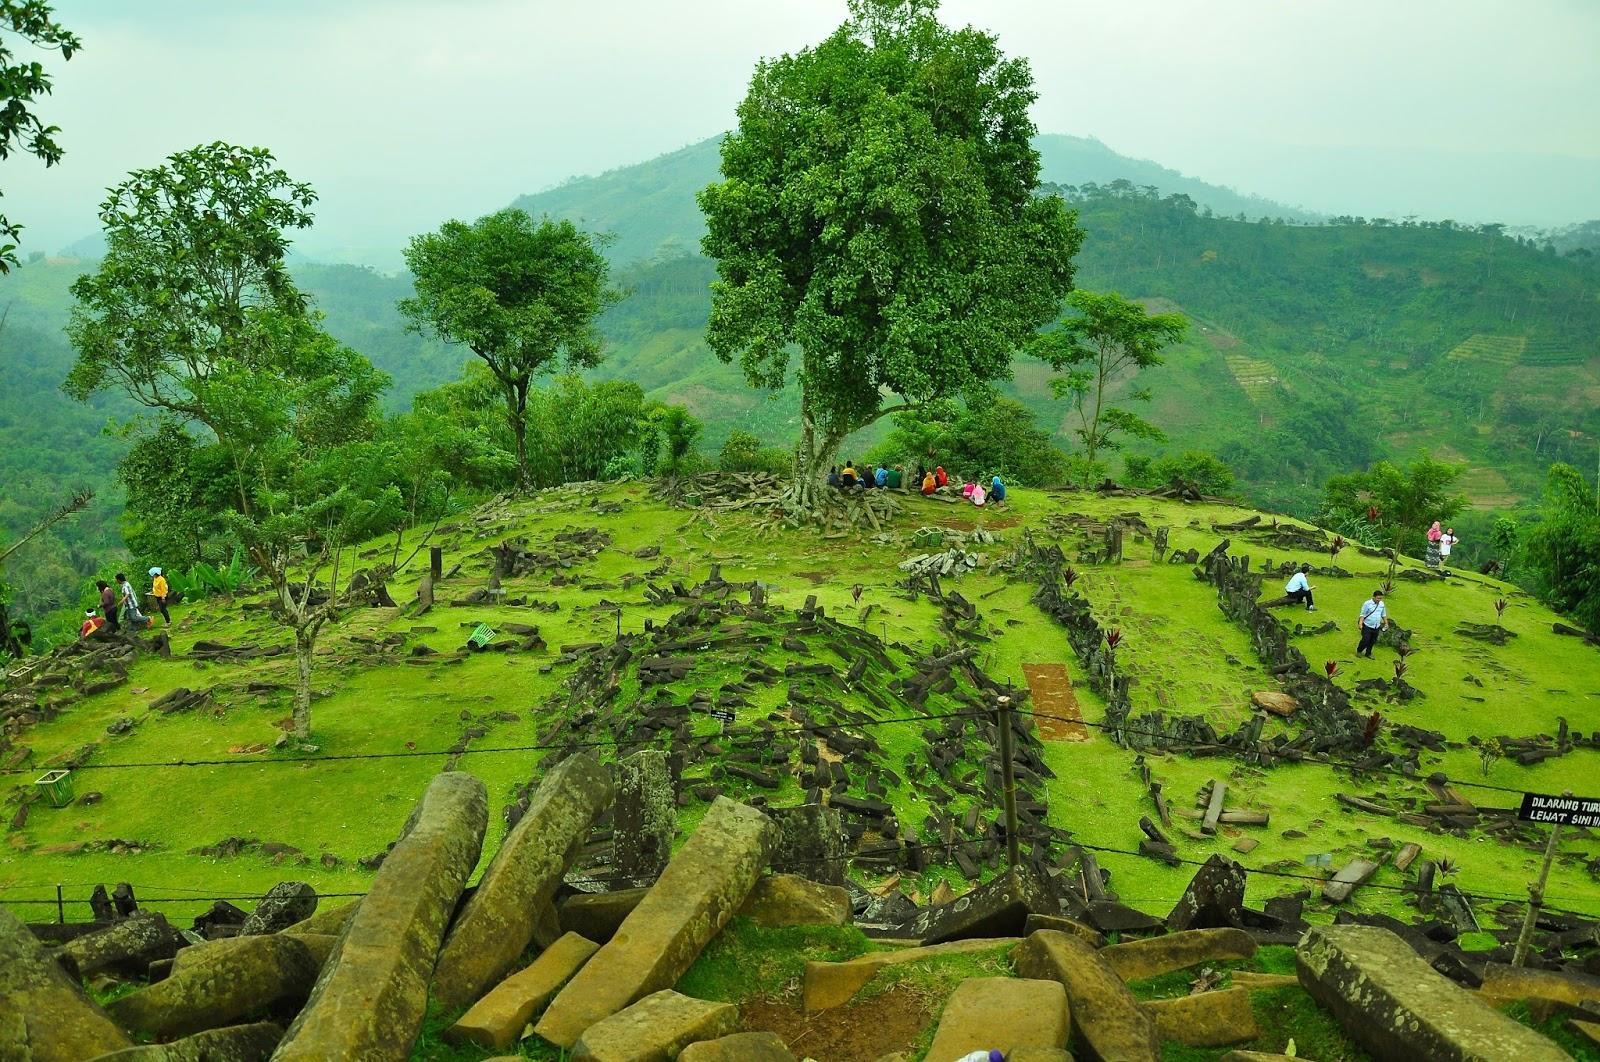 Gunung Padang Megalithic Site, Cianjur, Indonesia